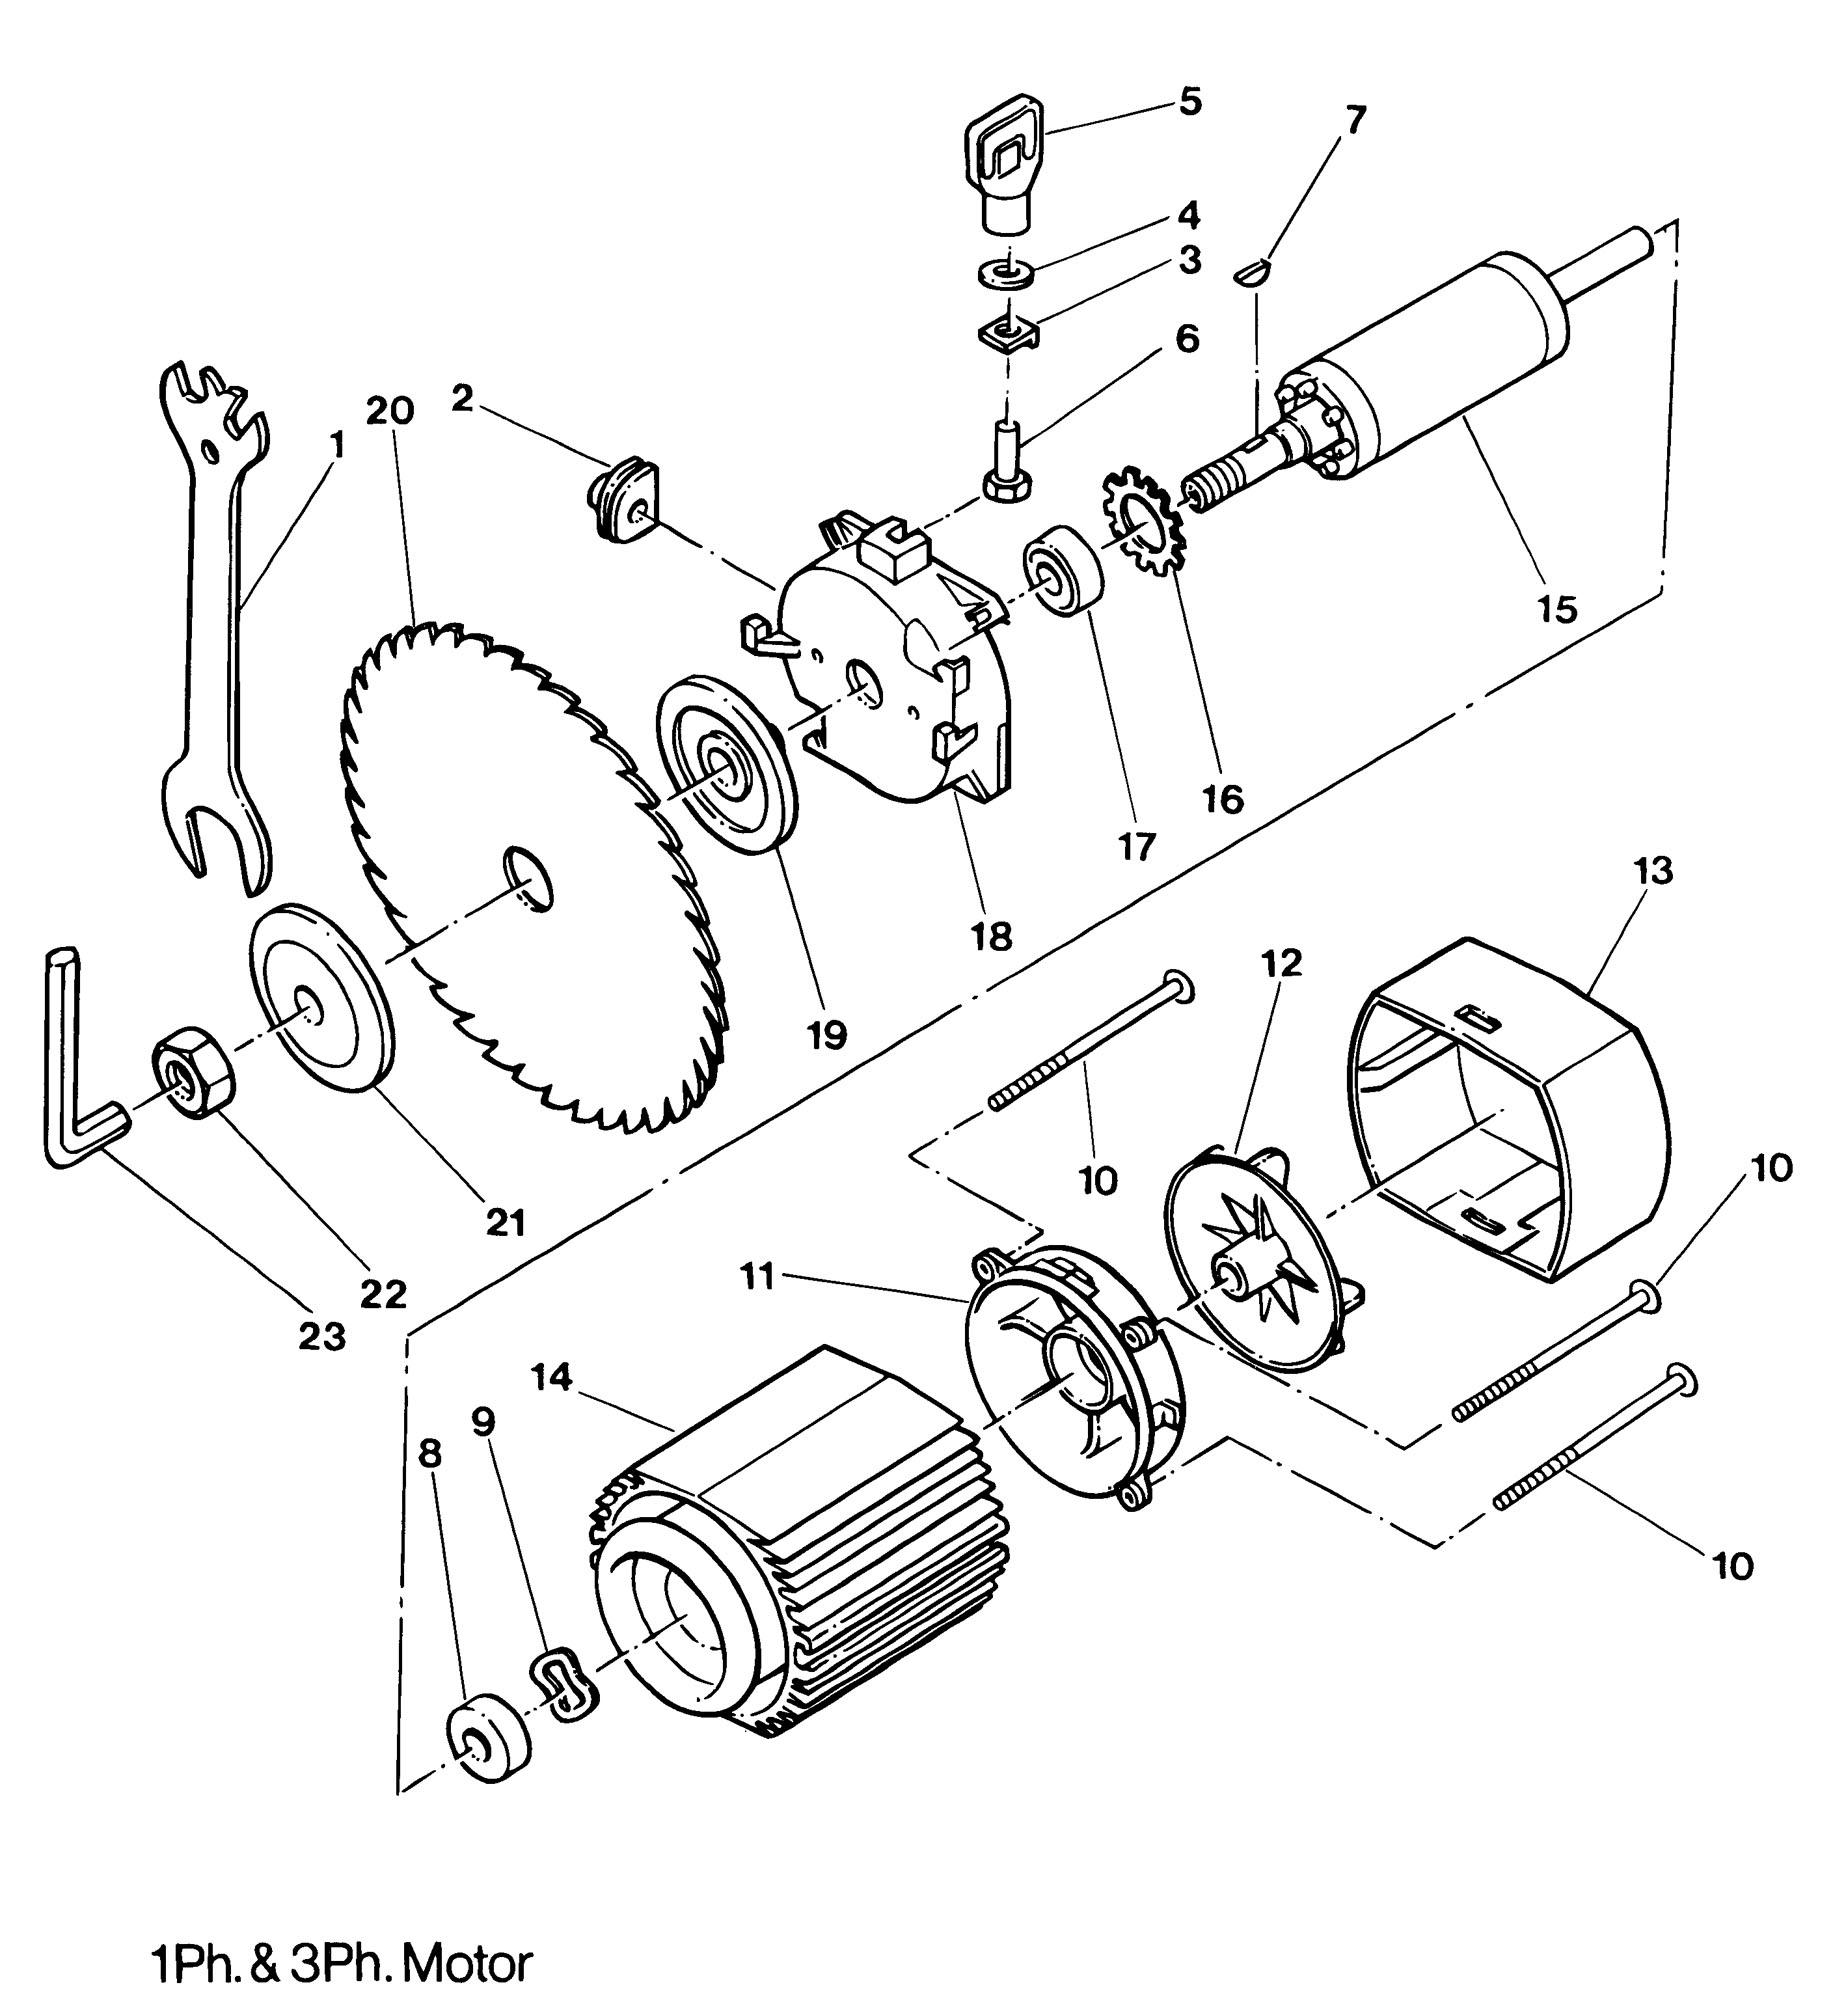 Spares for Dewalt Dw1501----h Radial Arm Saw (type 1